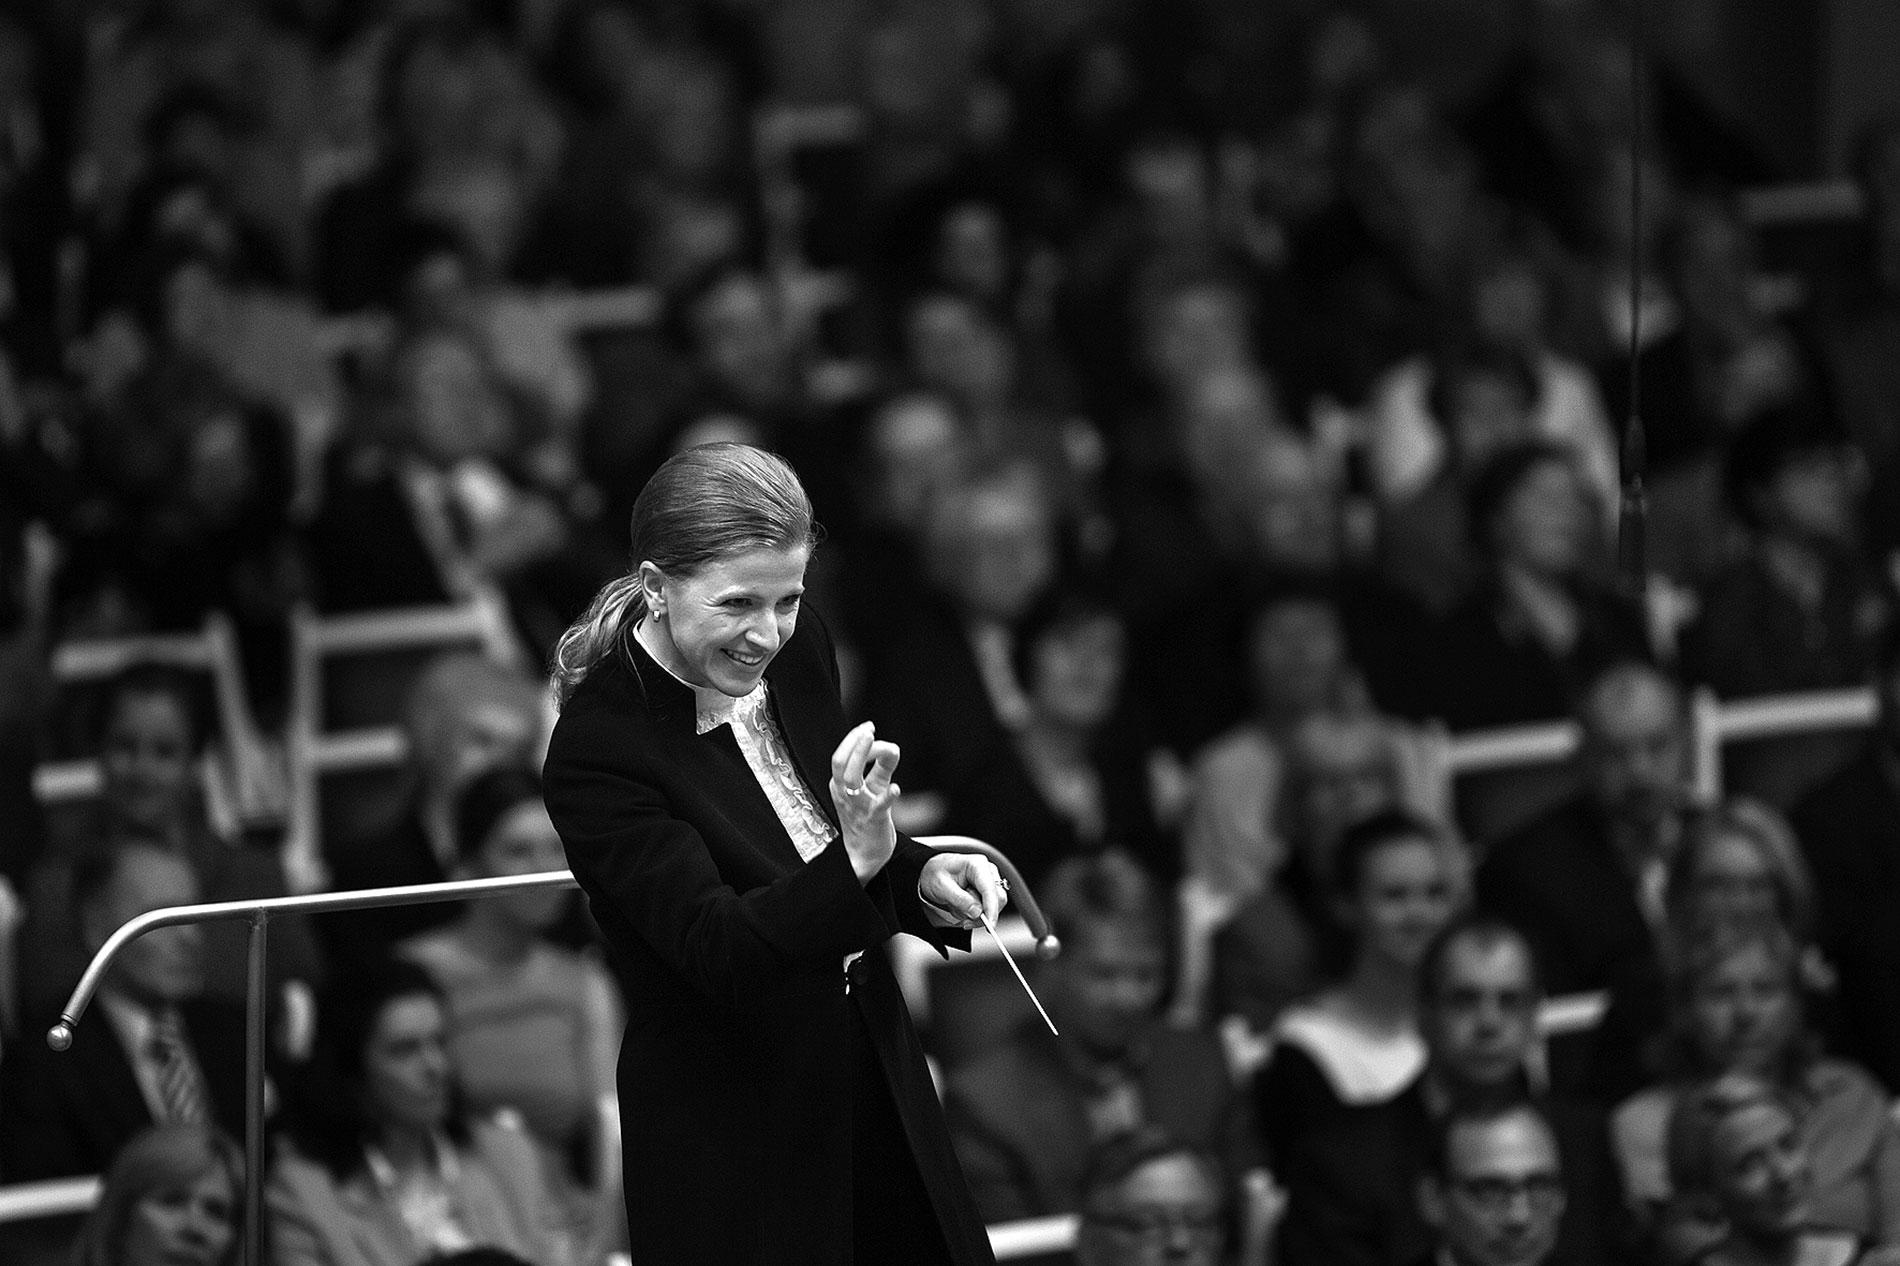 Kristiina Poska, Gewinnerin des Deutschen Dirigentenpreises 2013